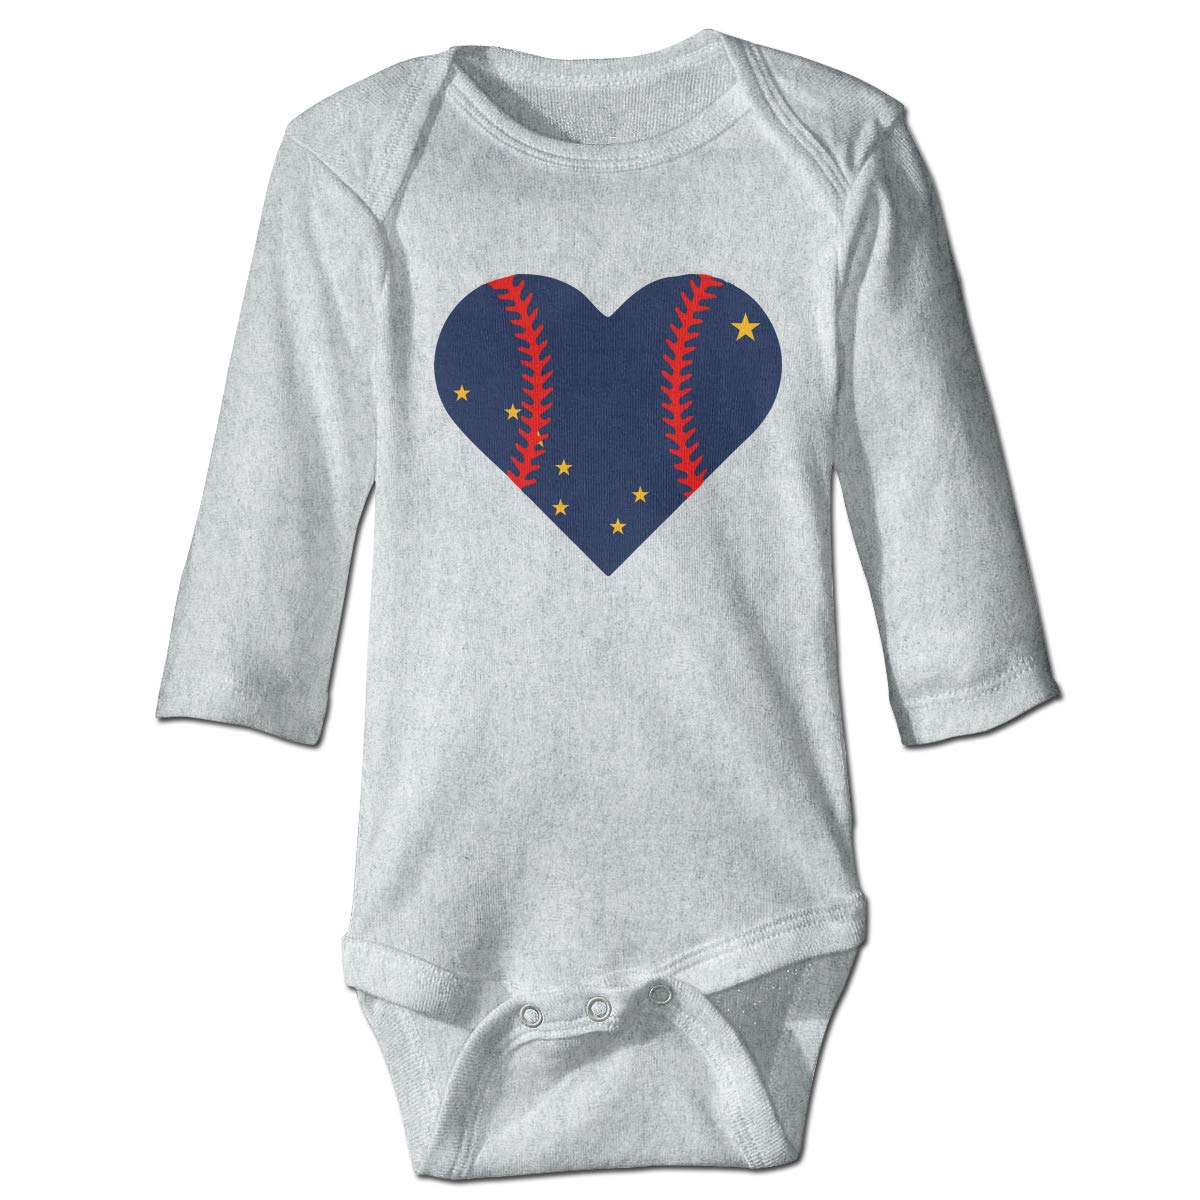 Infant Baby Boys Girls Long Sleeve Jumpsuit Romper Alaska Flag Baseball Heart Unisex Button Playsuit Outfit Clothes